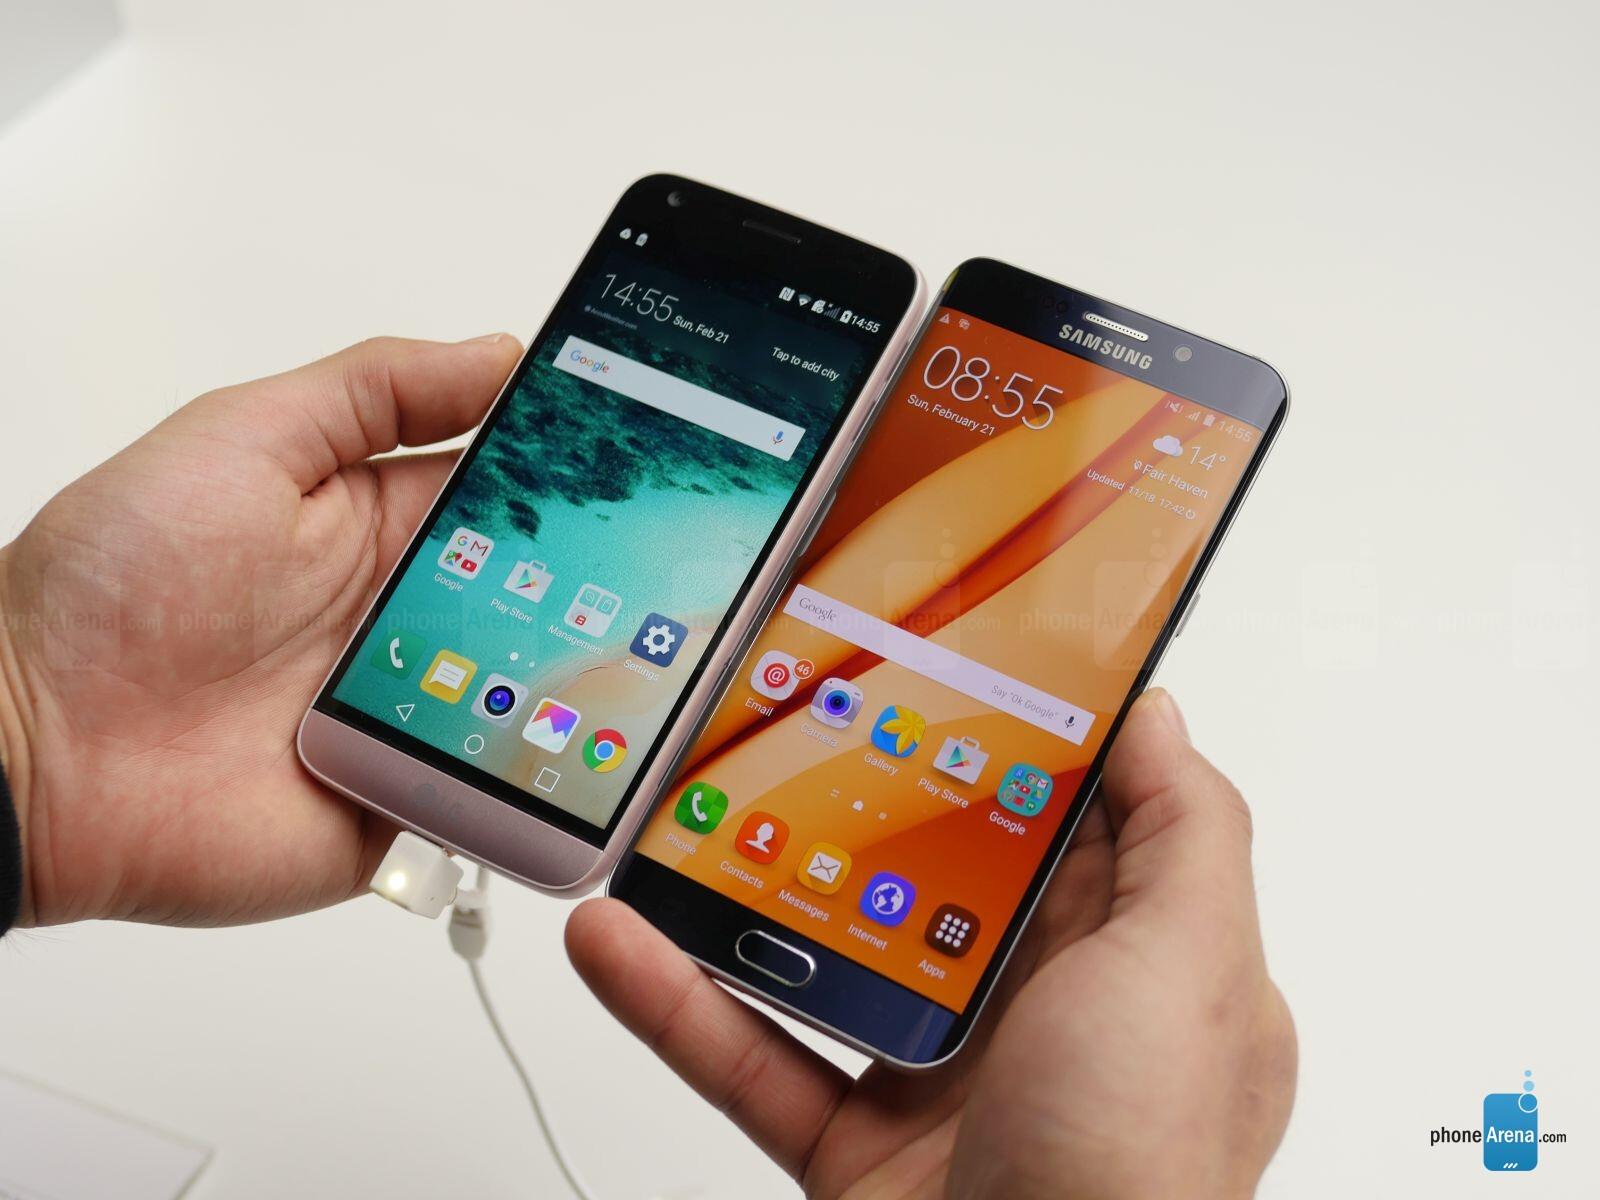 LG G5 vs Samsung Galaxy S6 edge+: first look